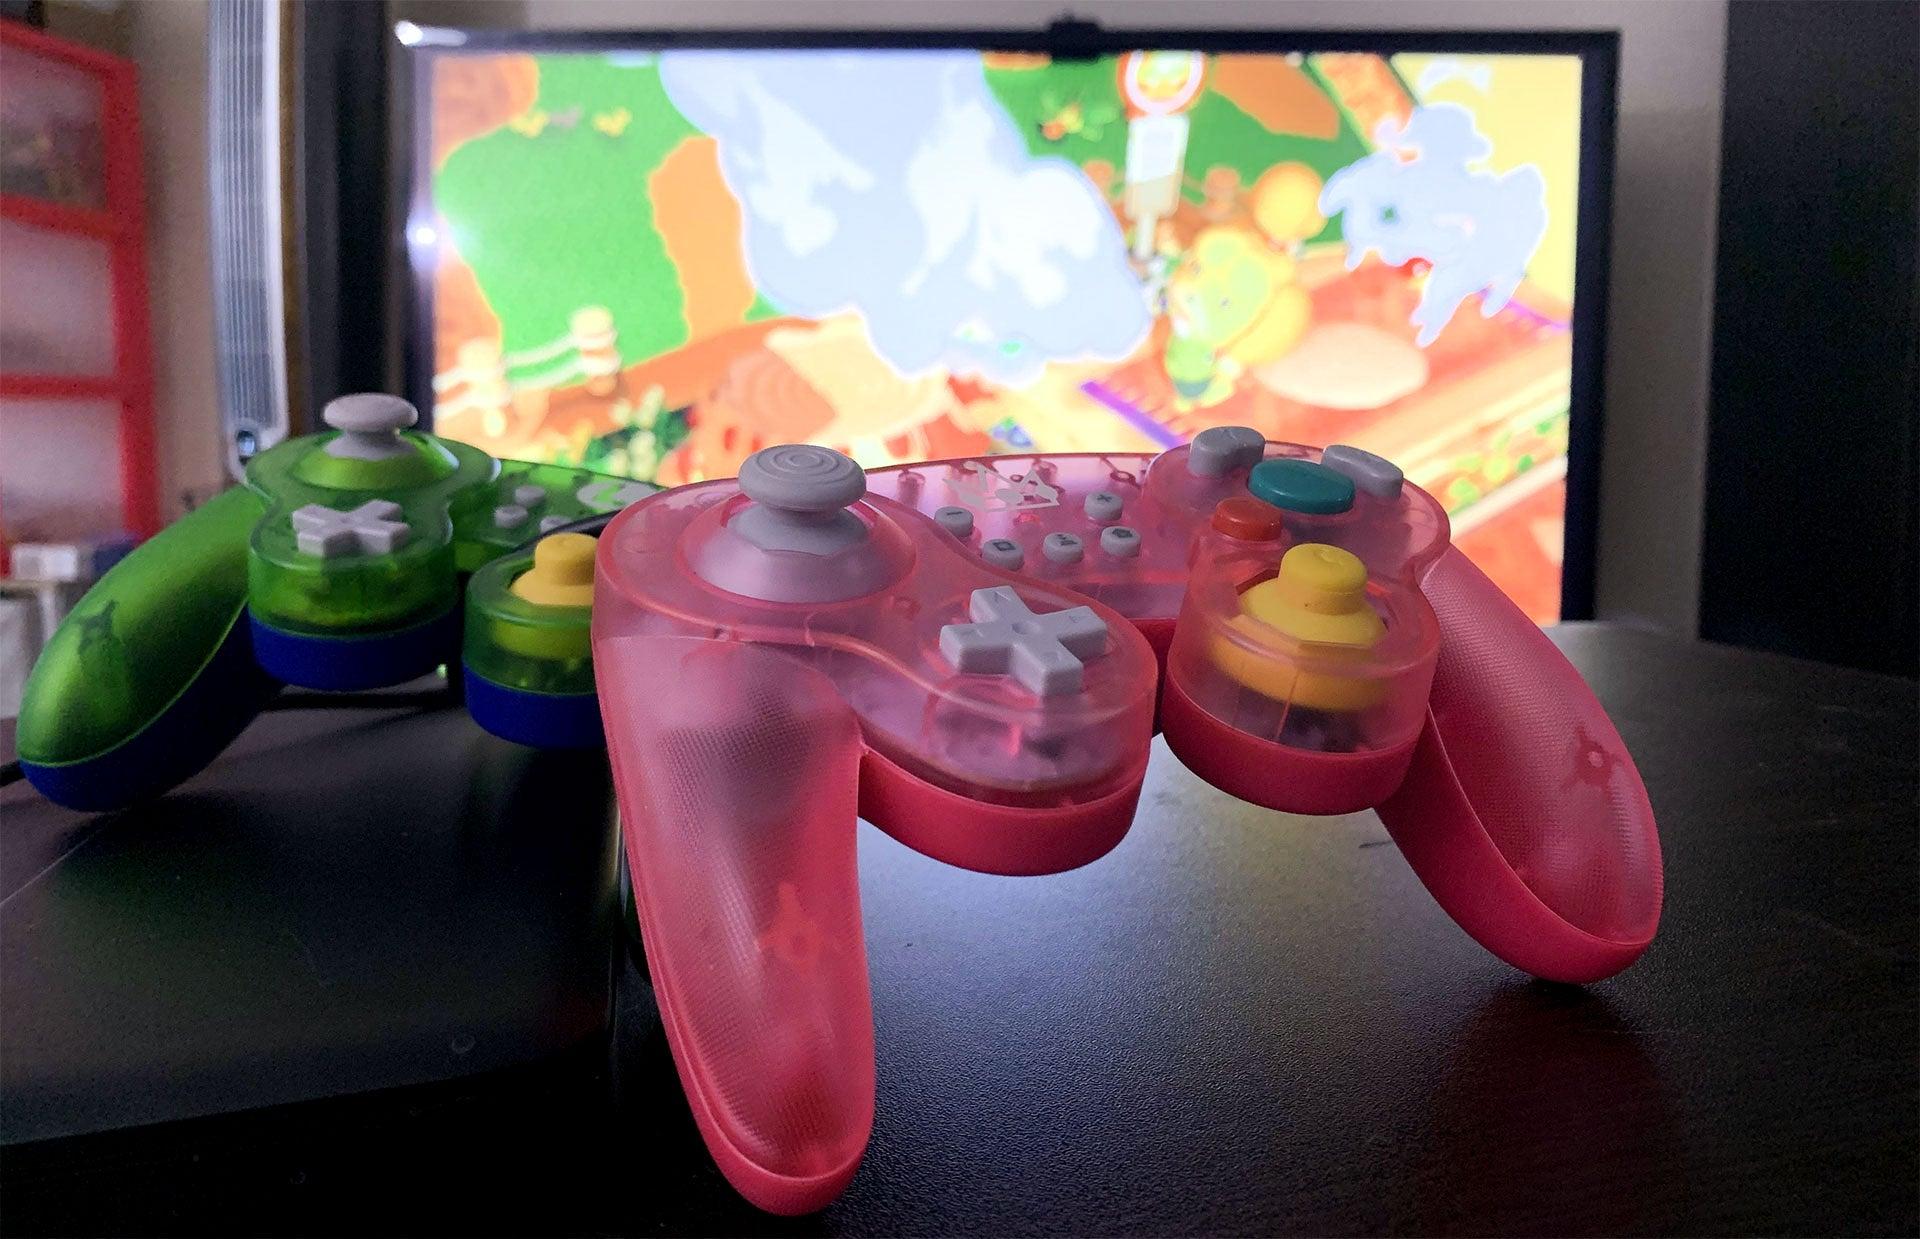 Show Us Your Smash Bros. Ultimate Controller Setup